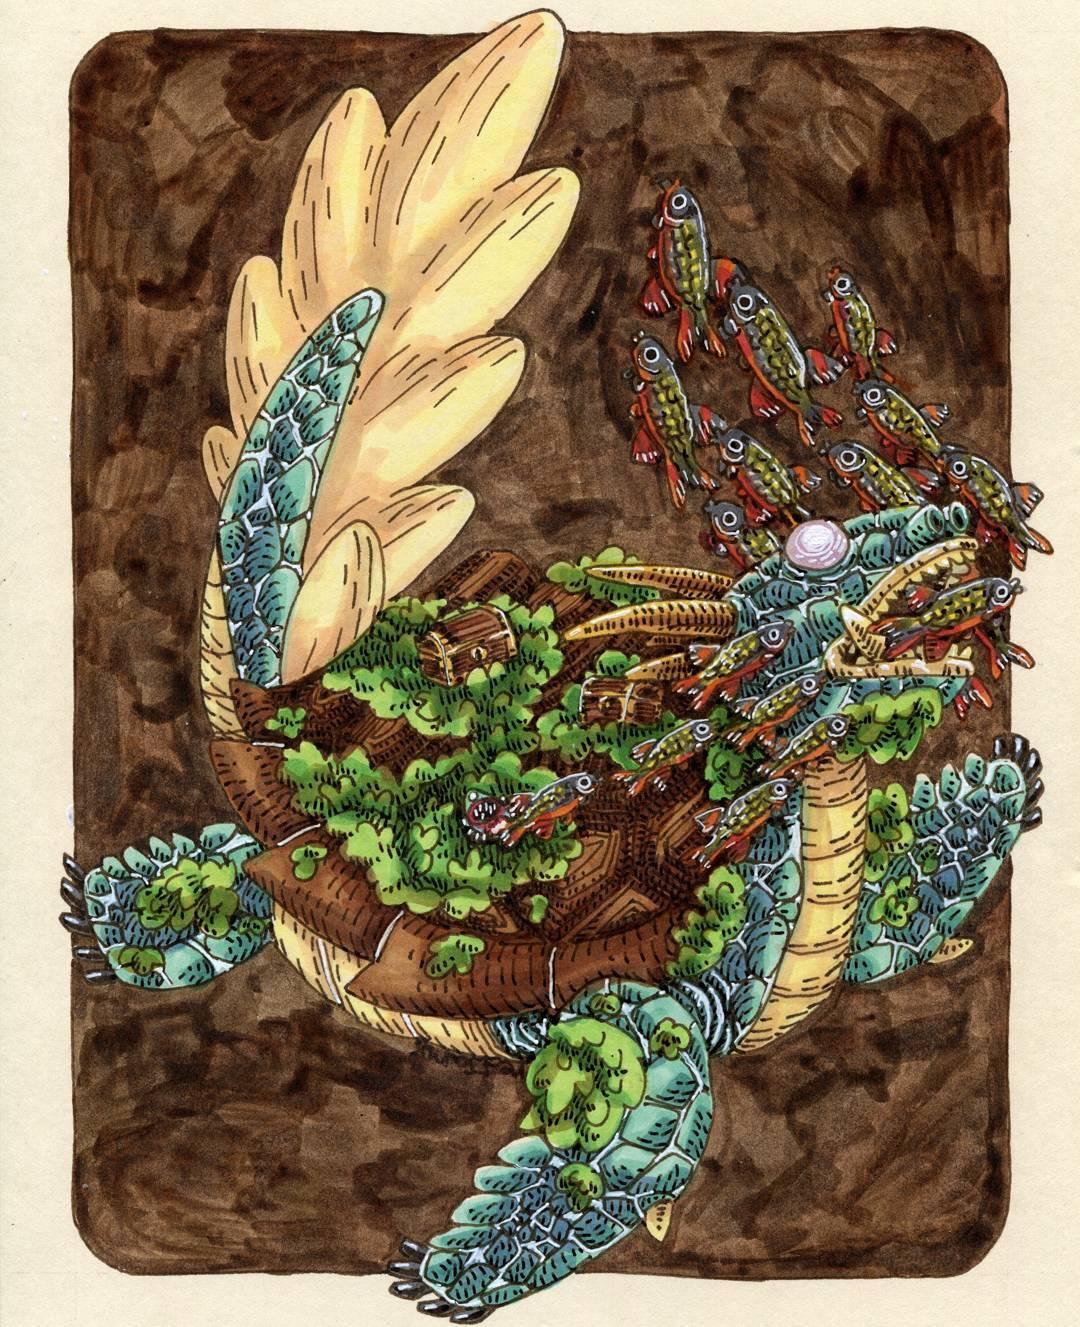 "redjarojam ""Dragon Turtle"" - by Jared DeCosta (redjarojam) www.instagram.com/redjarojam (2016-2019) © dell'autore tutti i diritti riservati"